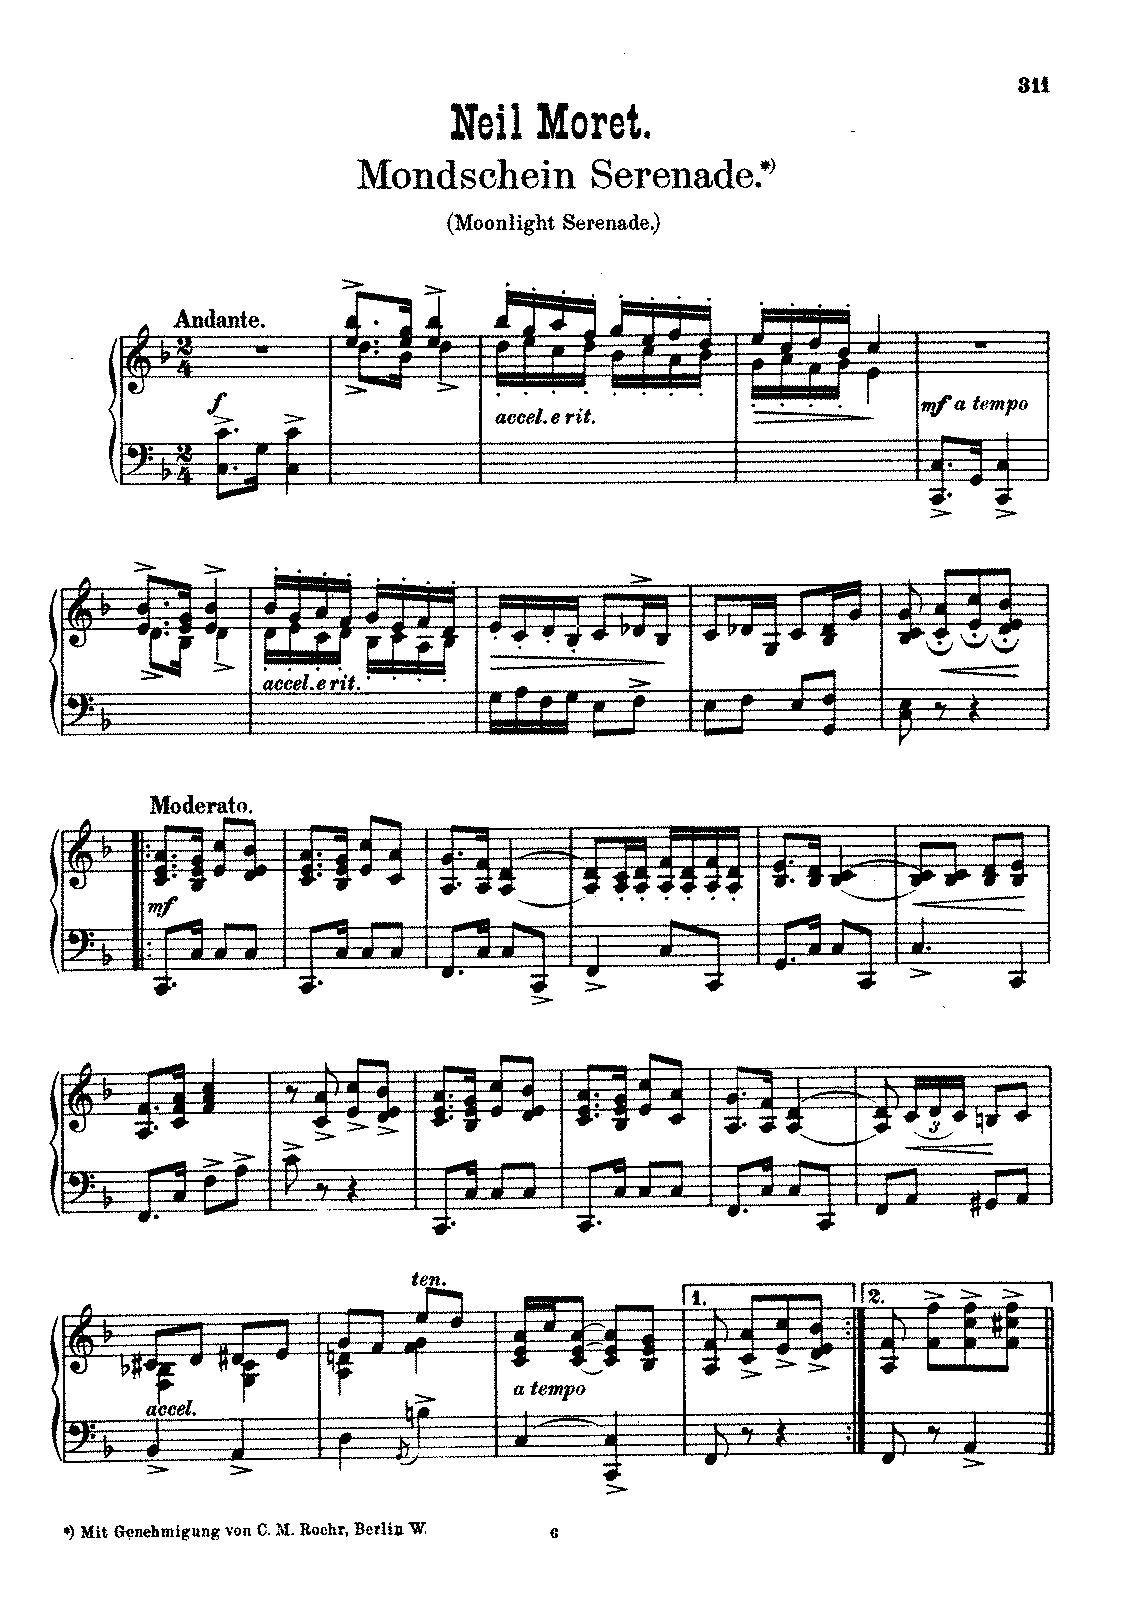 moonlight serenade  daniels  charles n    petrucci music library  free public domain